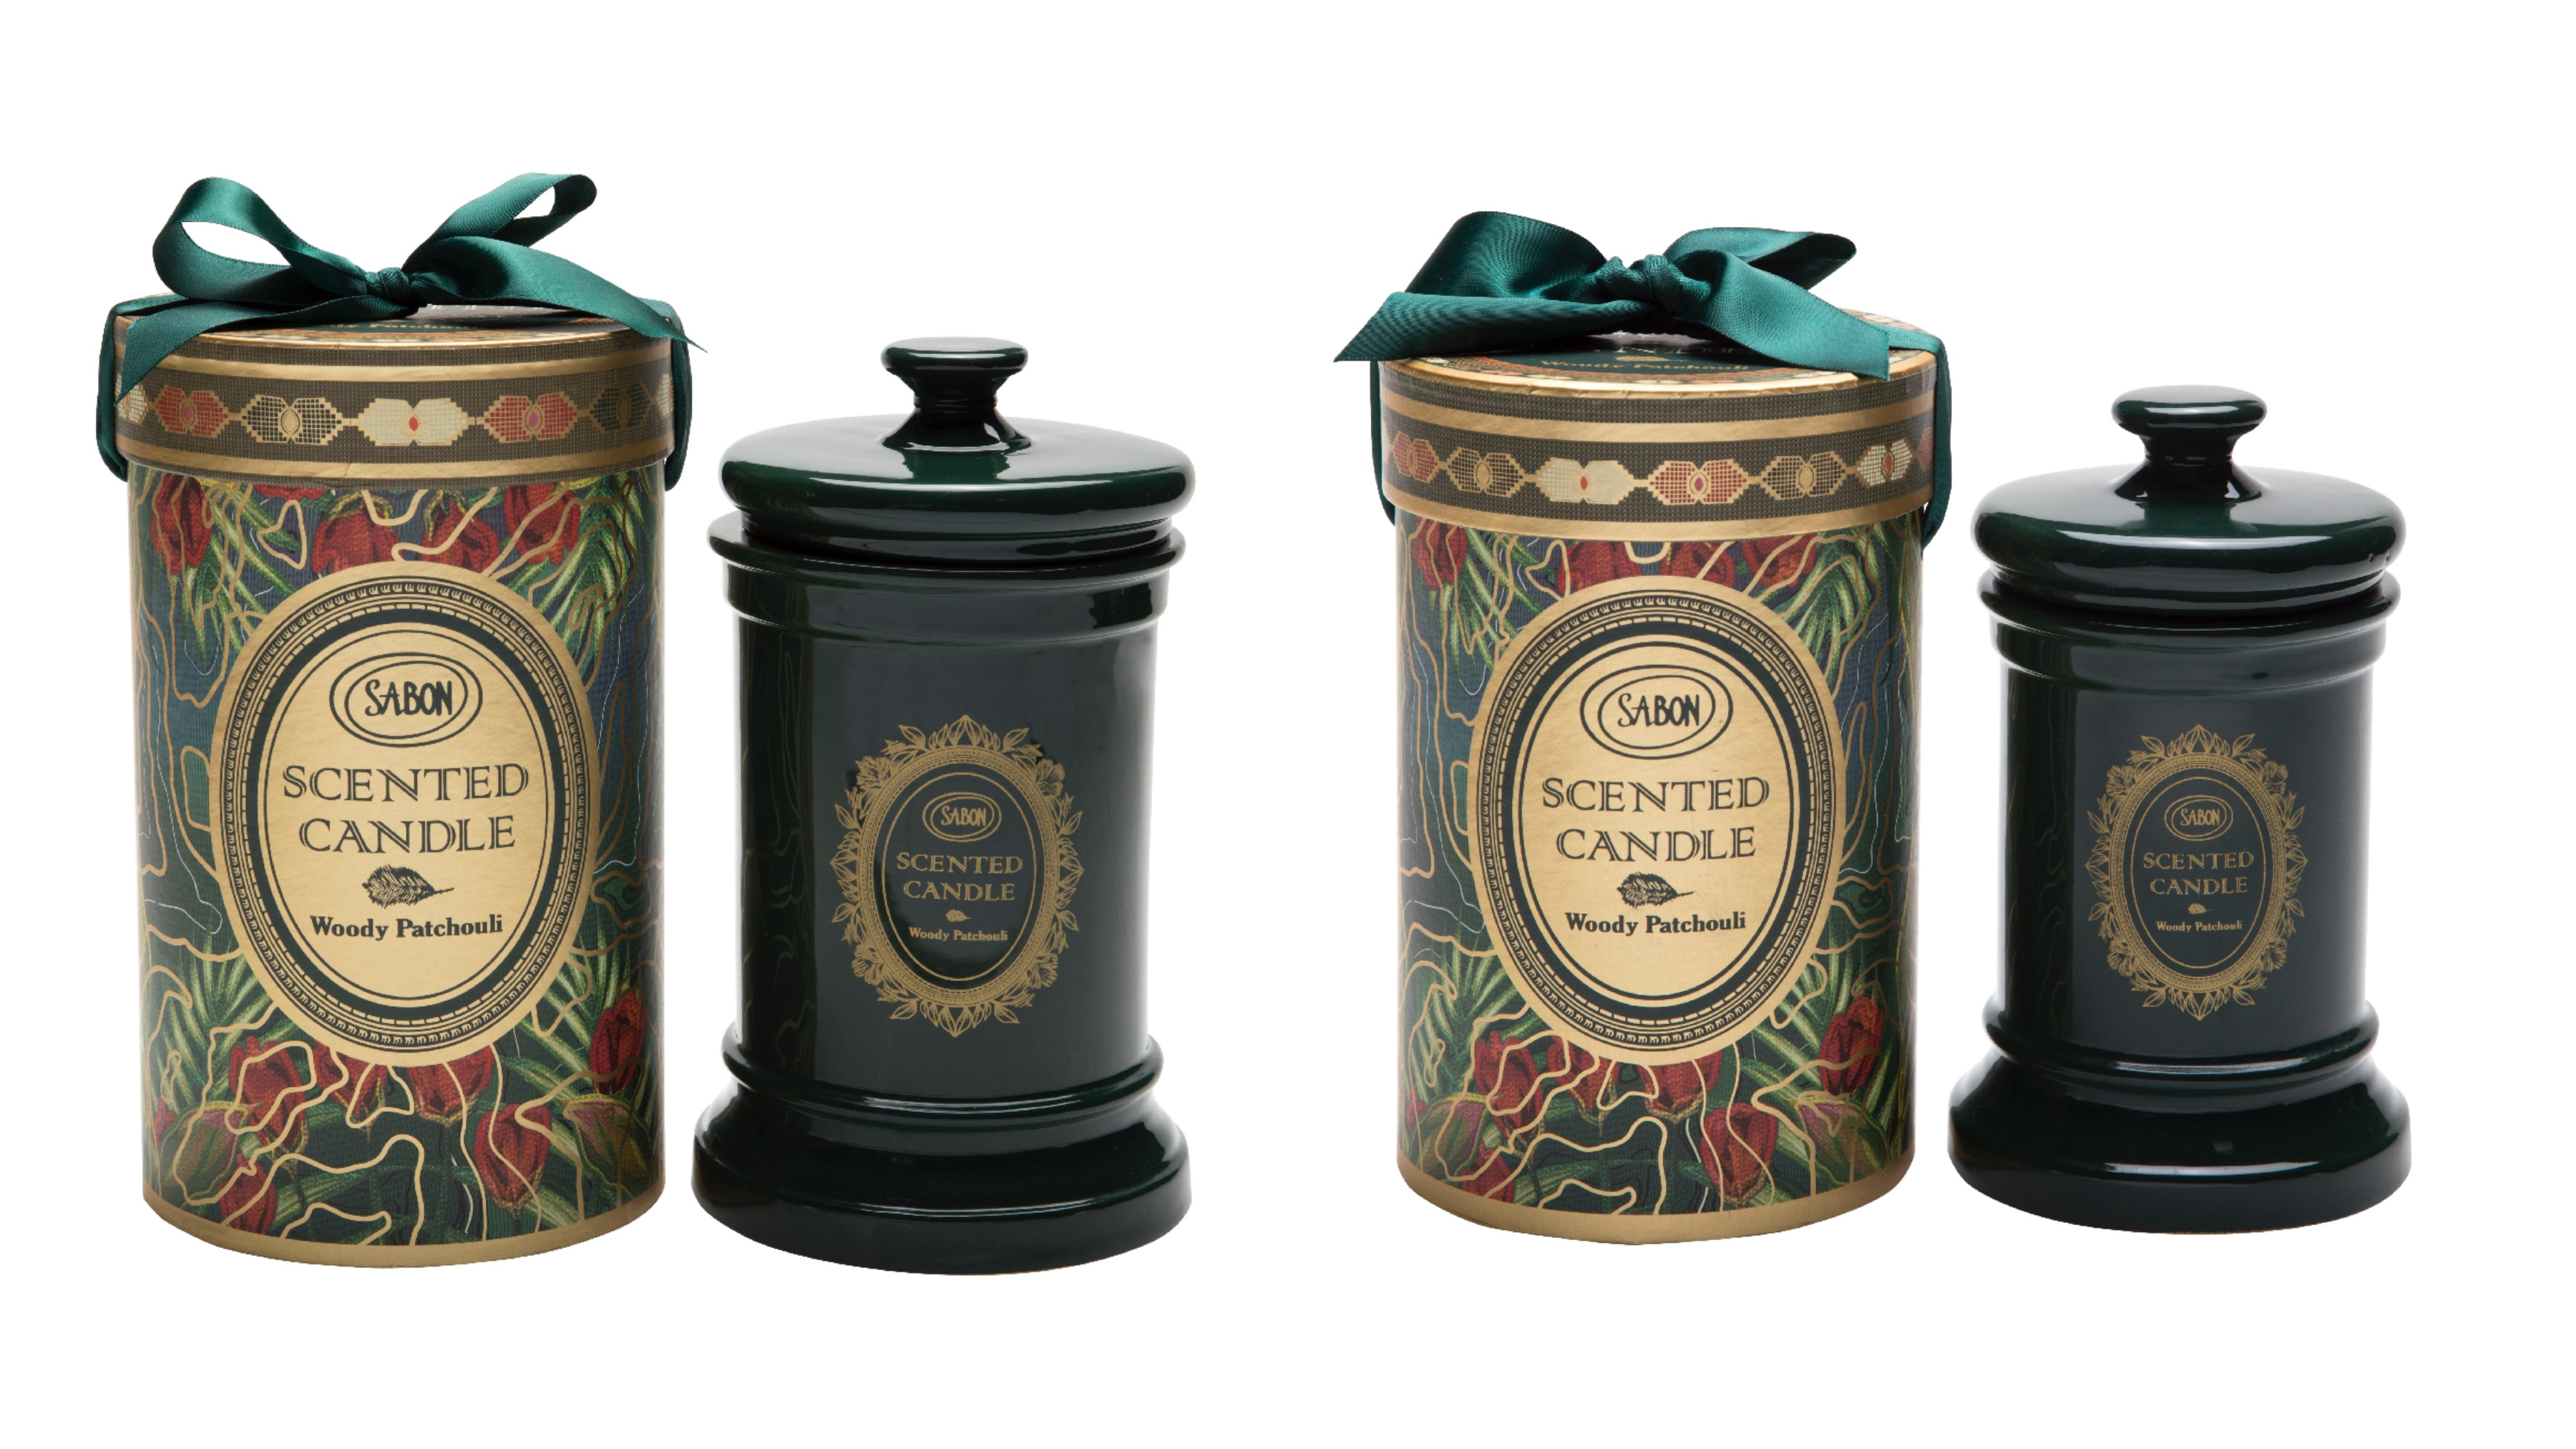 暮光森林陶瓷蠟燭 Candle Ceramic